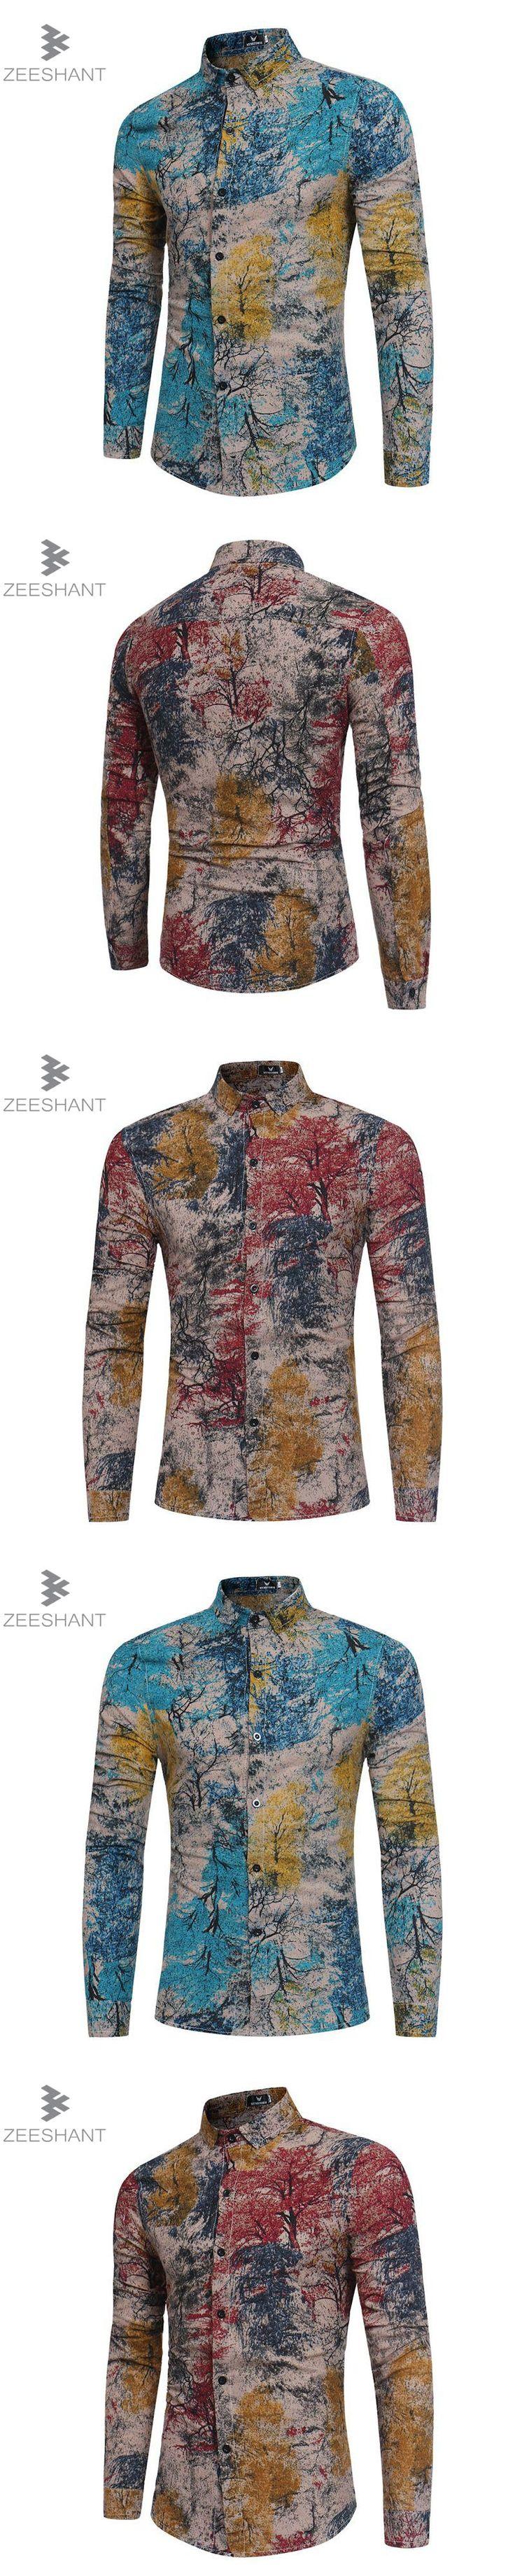 ZEESHANT Mens Slim Fit Shirts Spring Autumn New Cotton Long Sleeve Business Men Shirt Slim Print Camisa Social Masculina XXXL